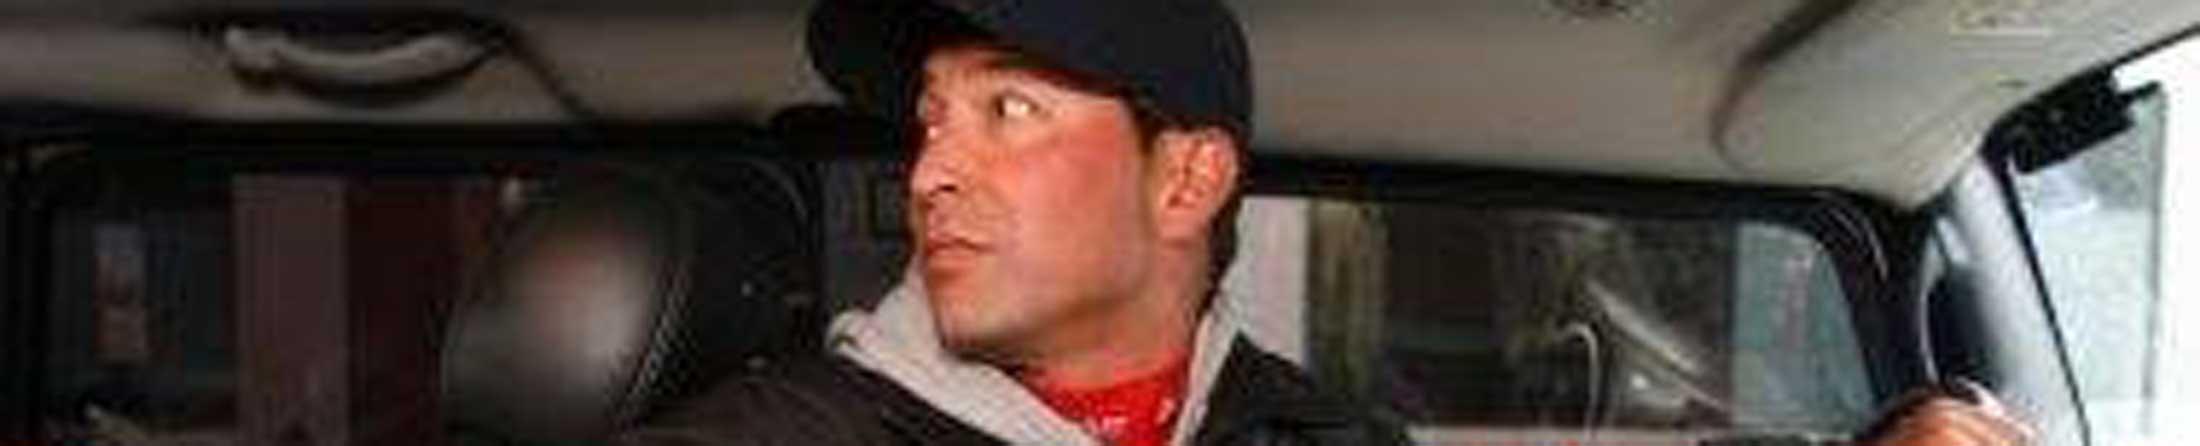 Paul Anderson, Boston Red Sox - header